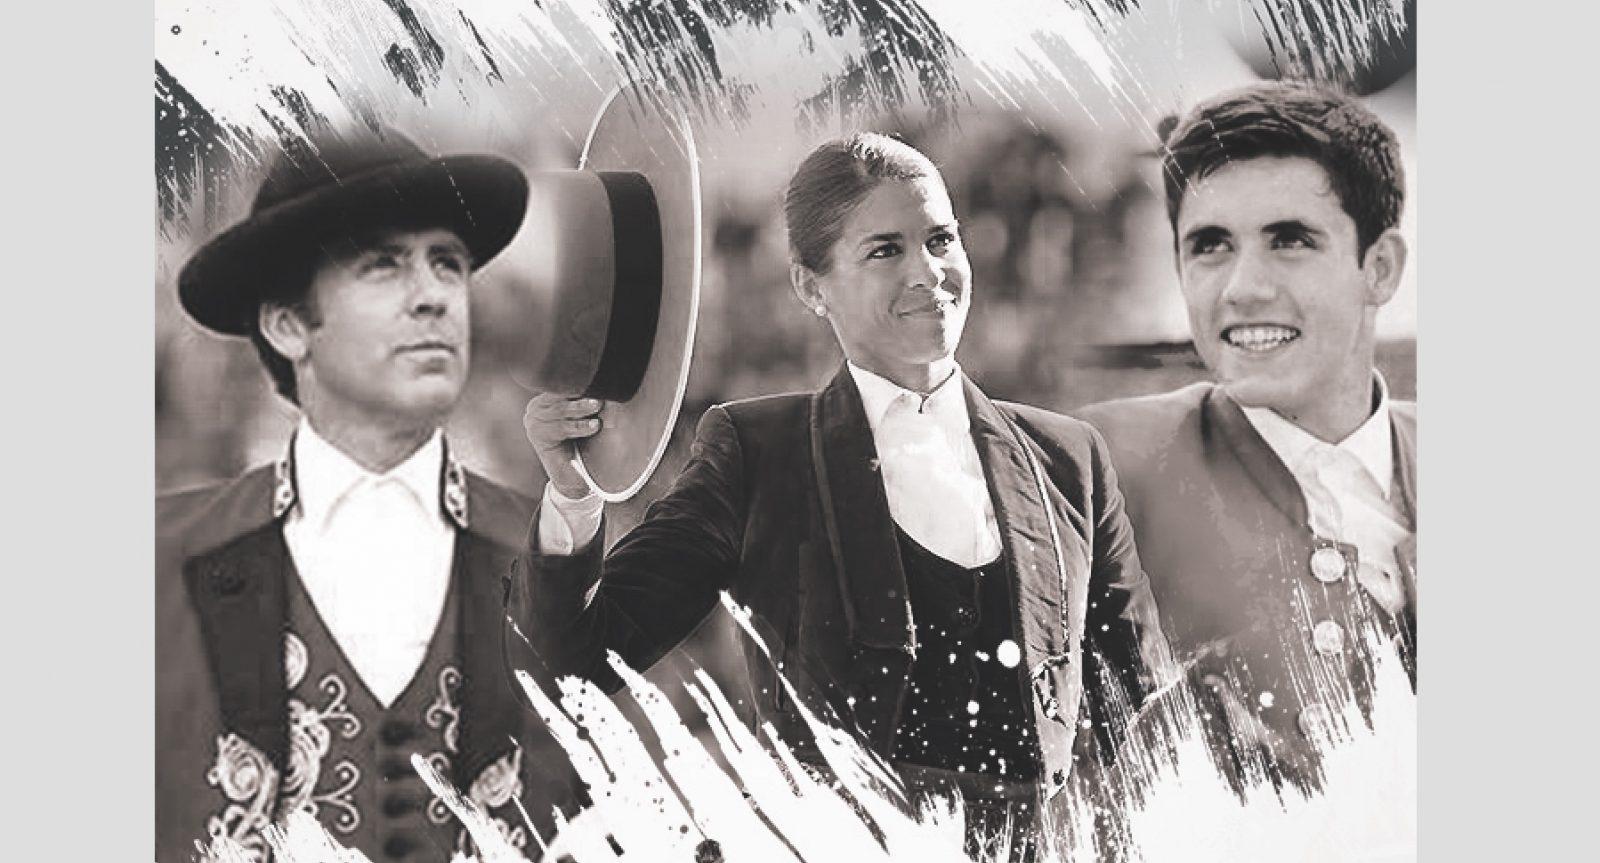 DIRECT LIVE TORO // FERIA NÎMES PENTECÔTE 2018 – CORRIDA MIXTE REJON (21/05/2018) – Pablo Hermoso de Mendoza, Léa Vicens et Guillermo Hermoso de Mendoza